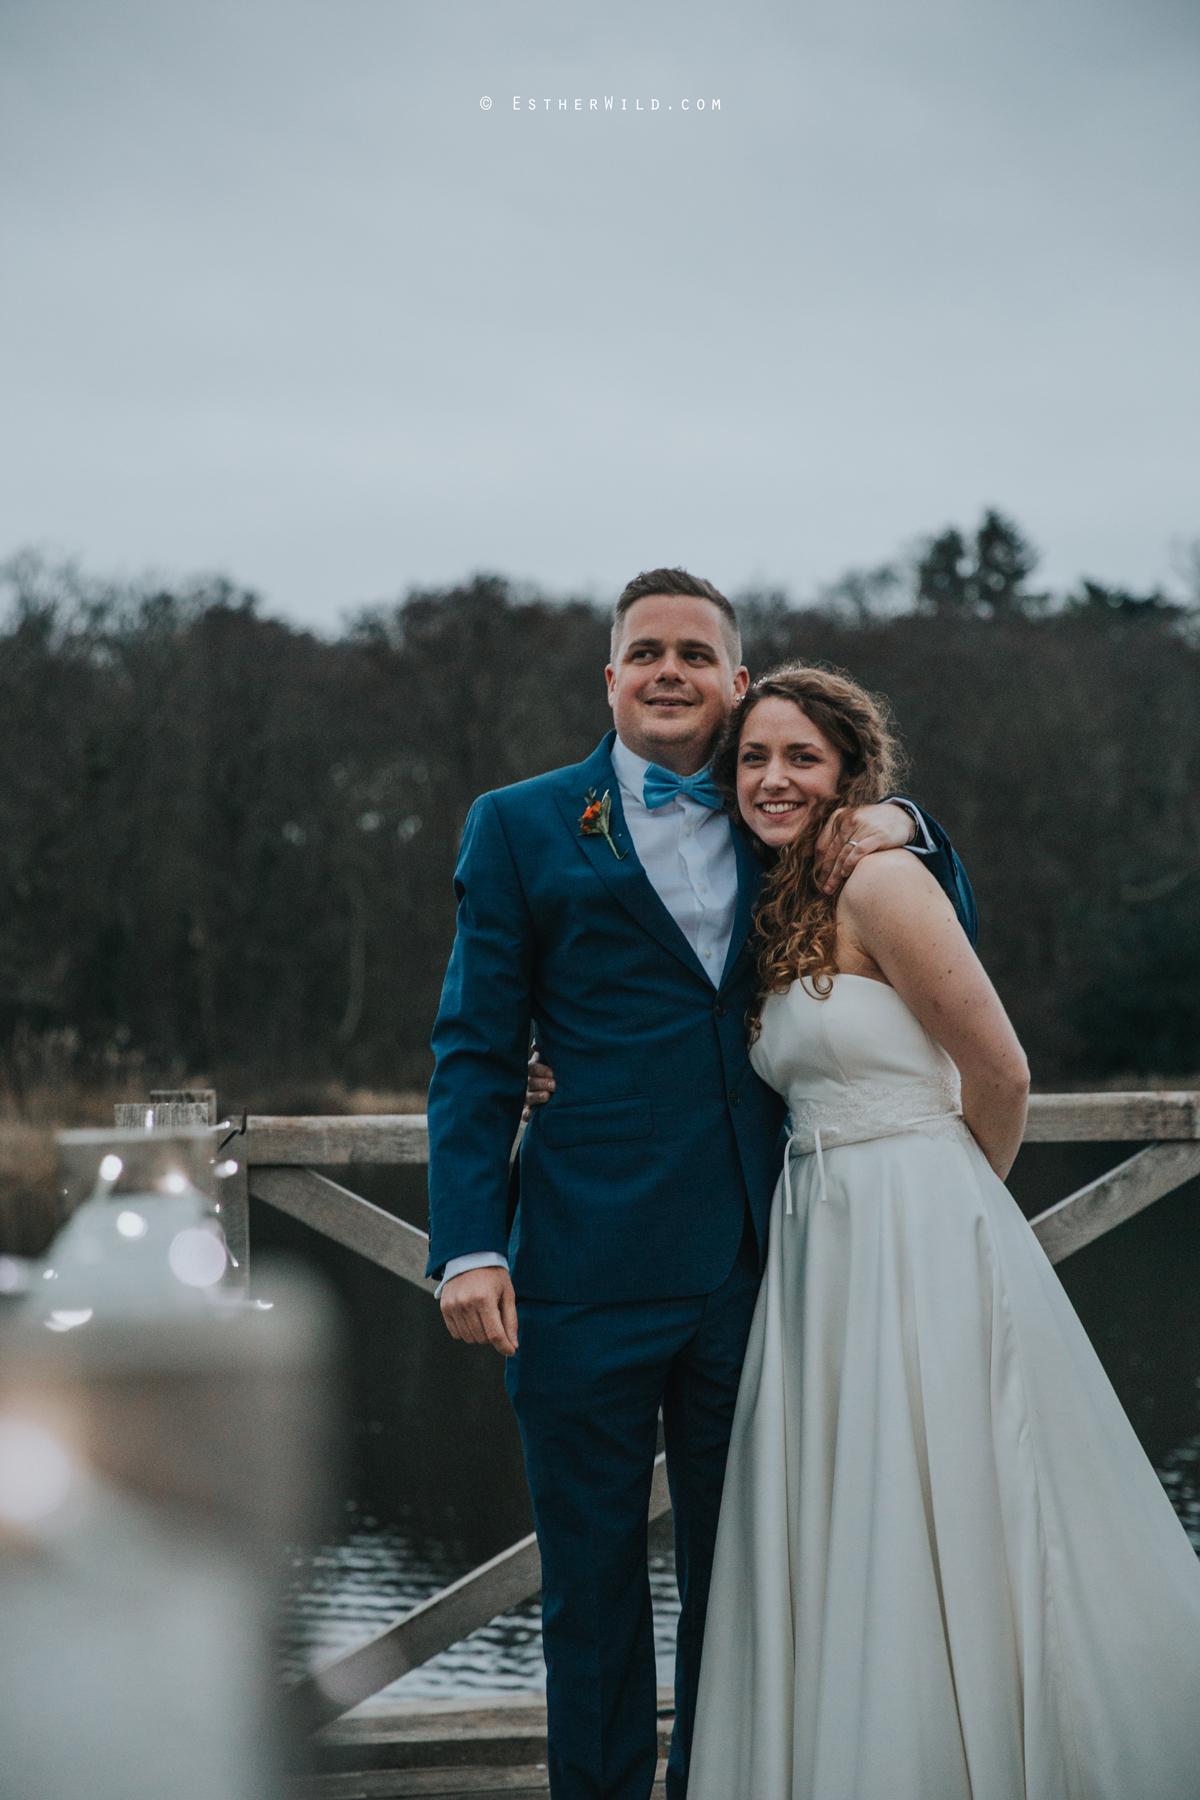 The_BoatHouse_Wedding_Venue_Ormesby_Norfolk_Broads_Boat_Wedding_Photography_Esther_Wild_Photographer_IMG_3372.jpg